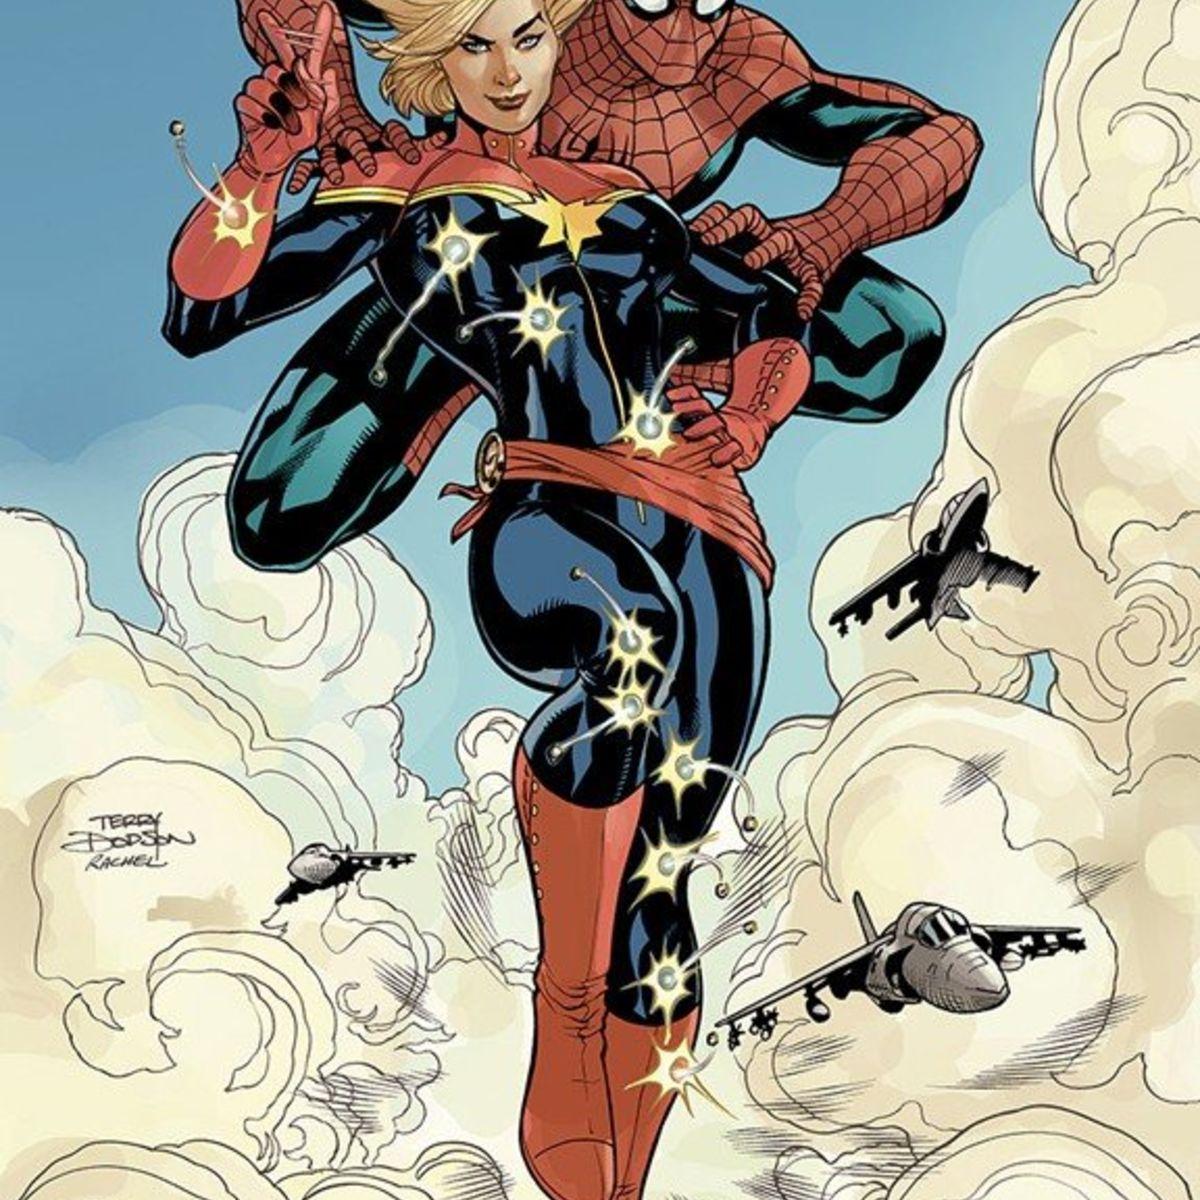 Captain-Marvel-Spider-Man-comics.jpg